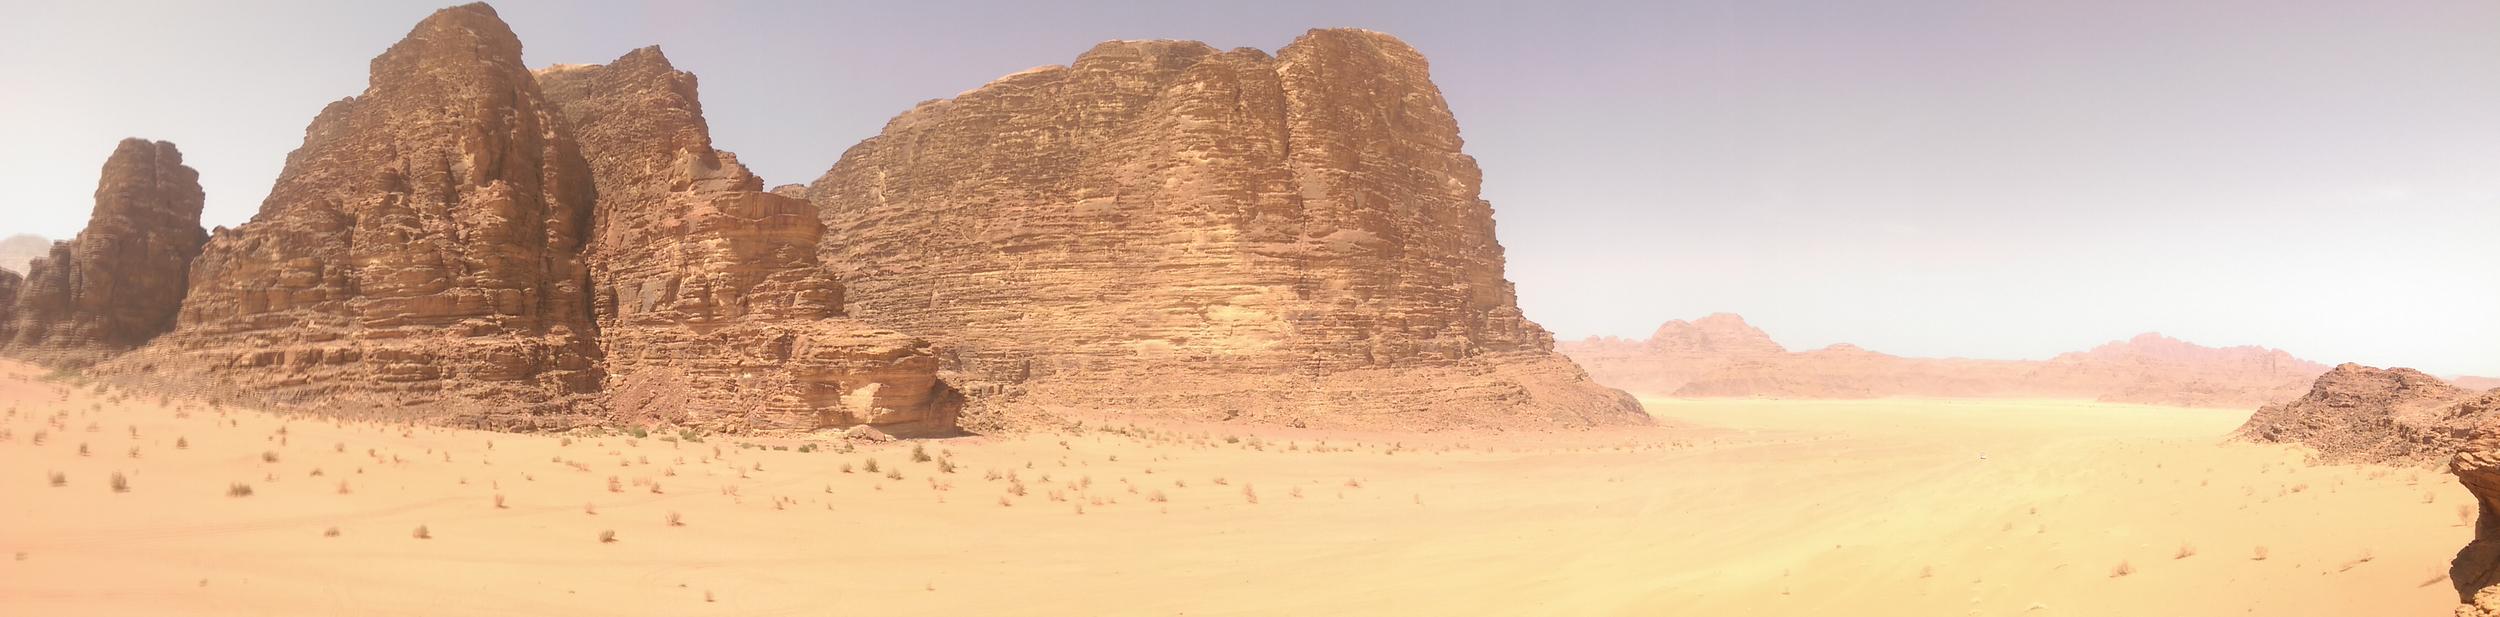 The scenery at Wadi Rum.